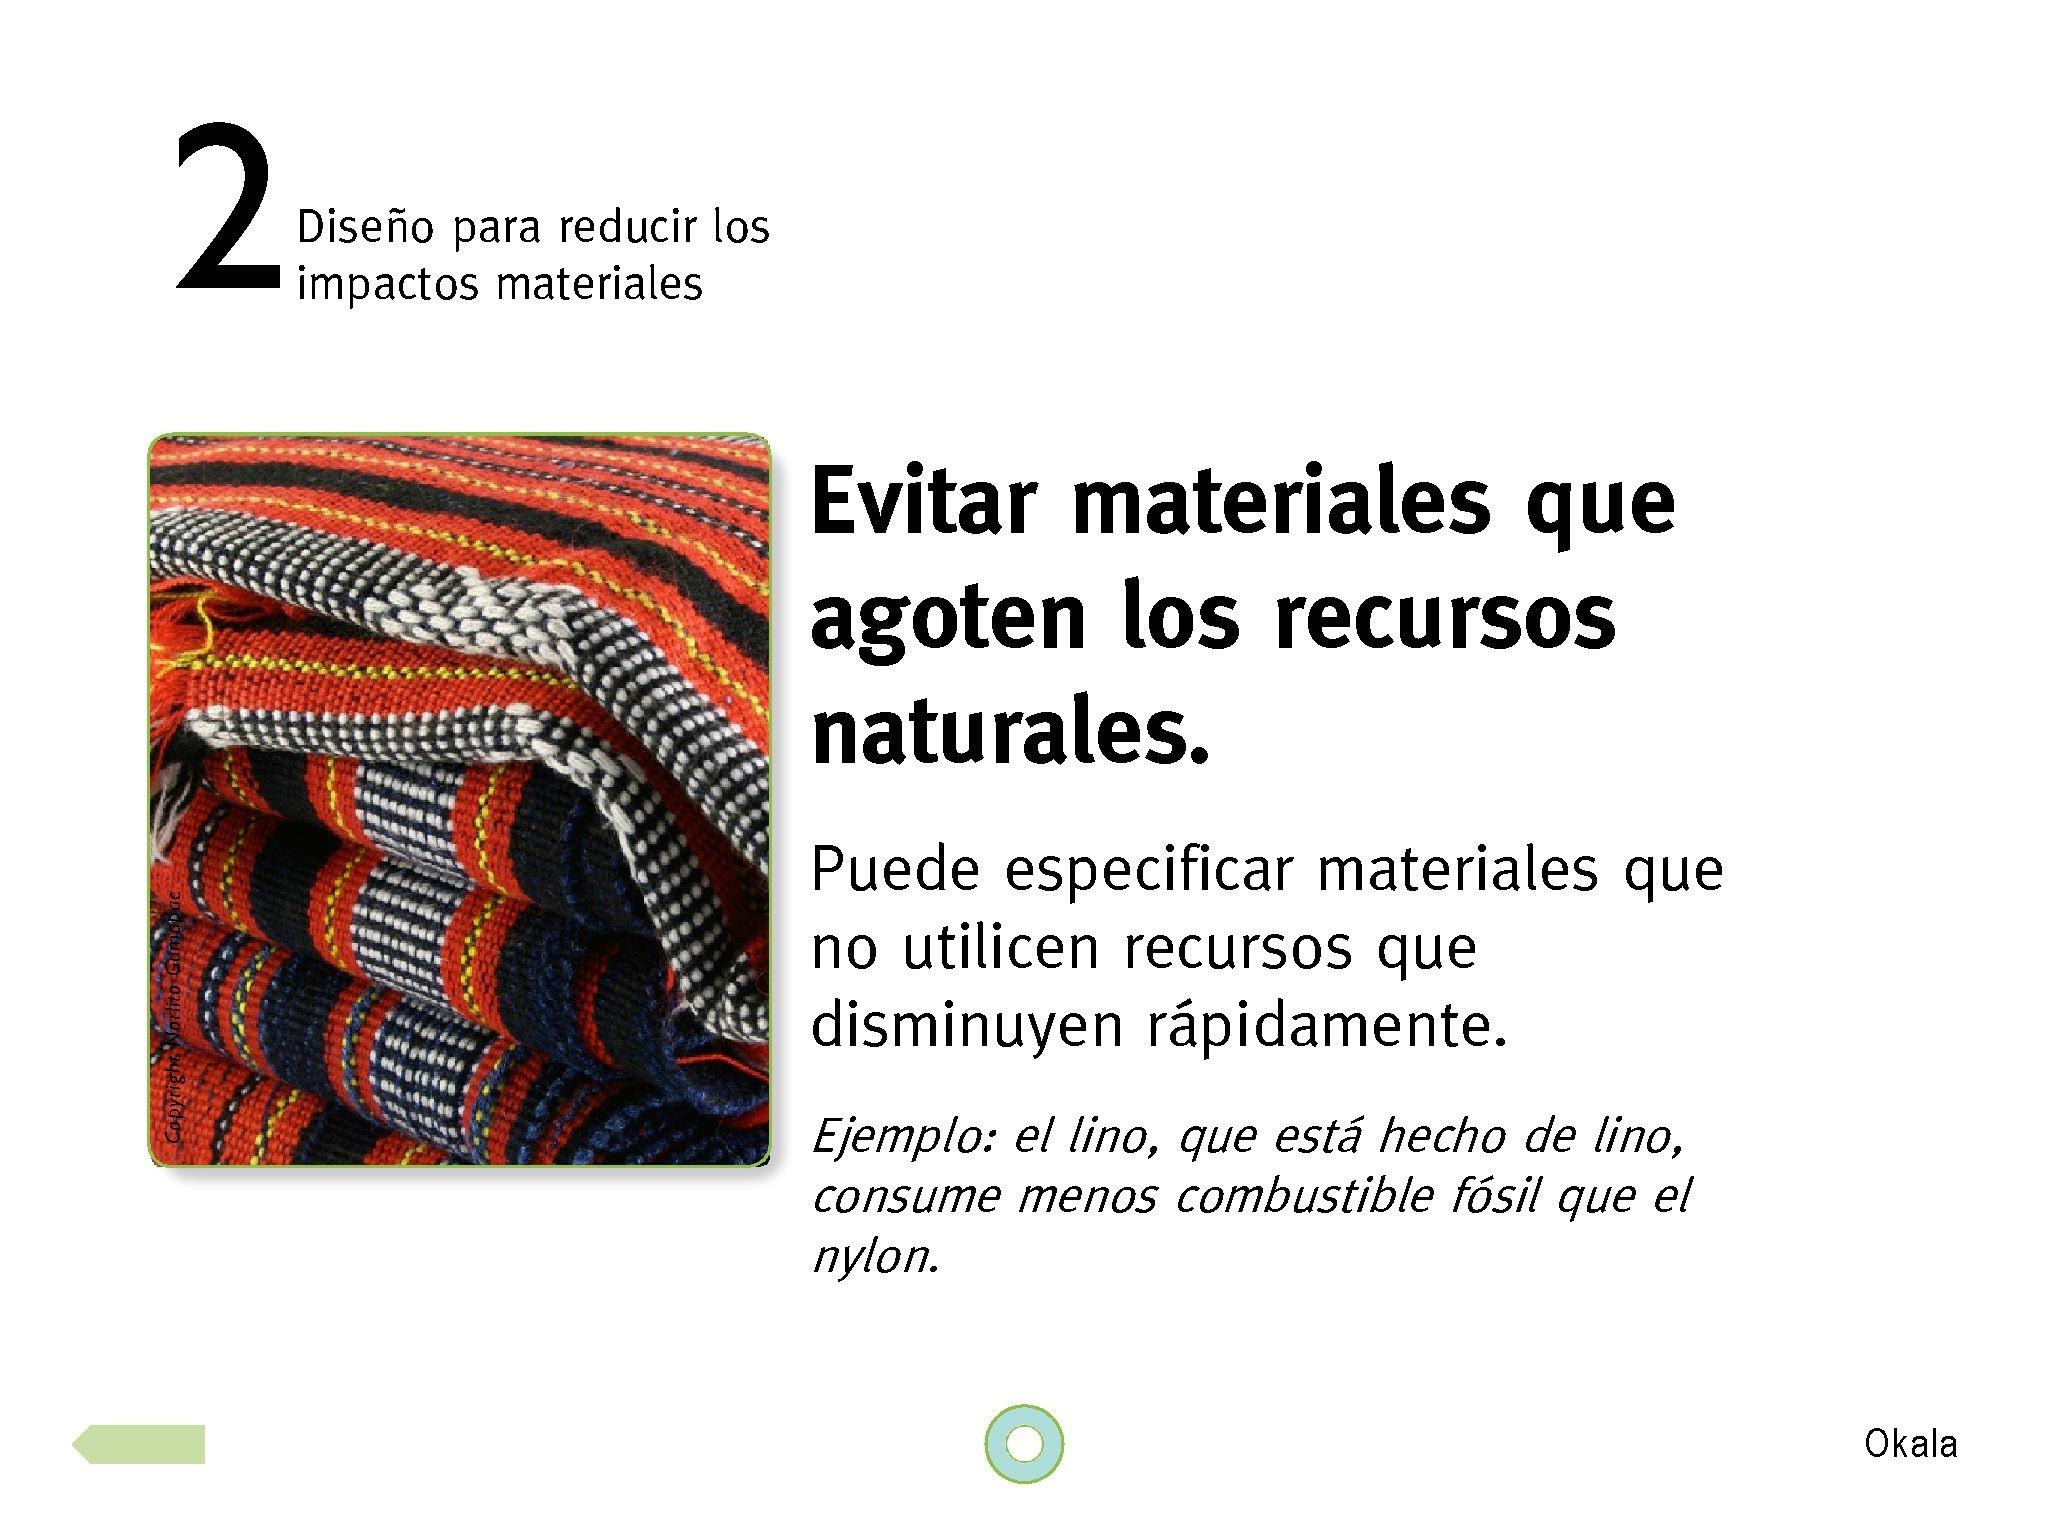 okala-ecodesign-strategy-guide-2012-spanish.new_page_10-1